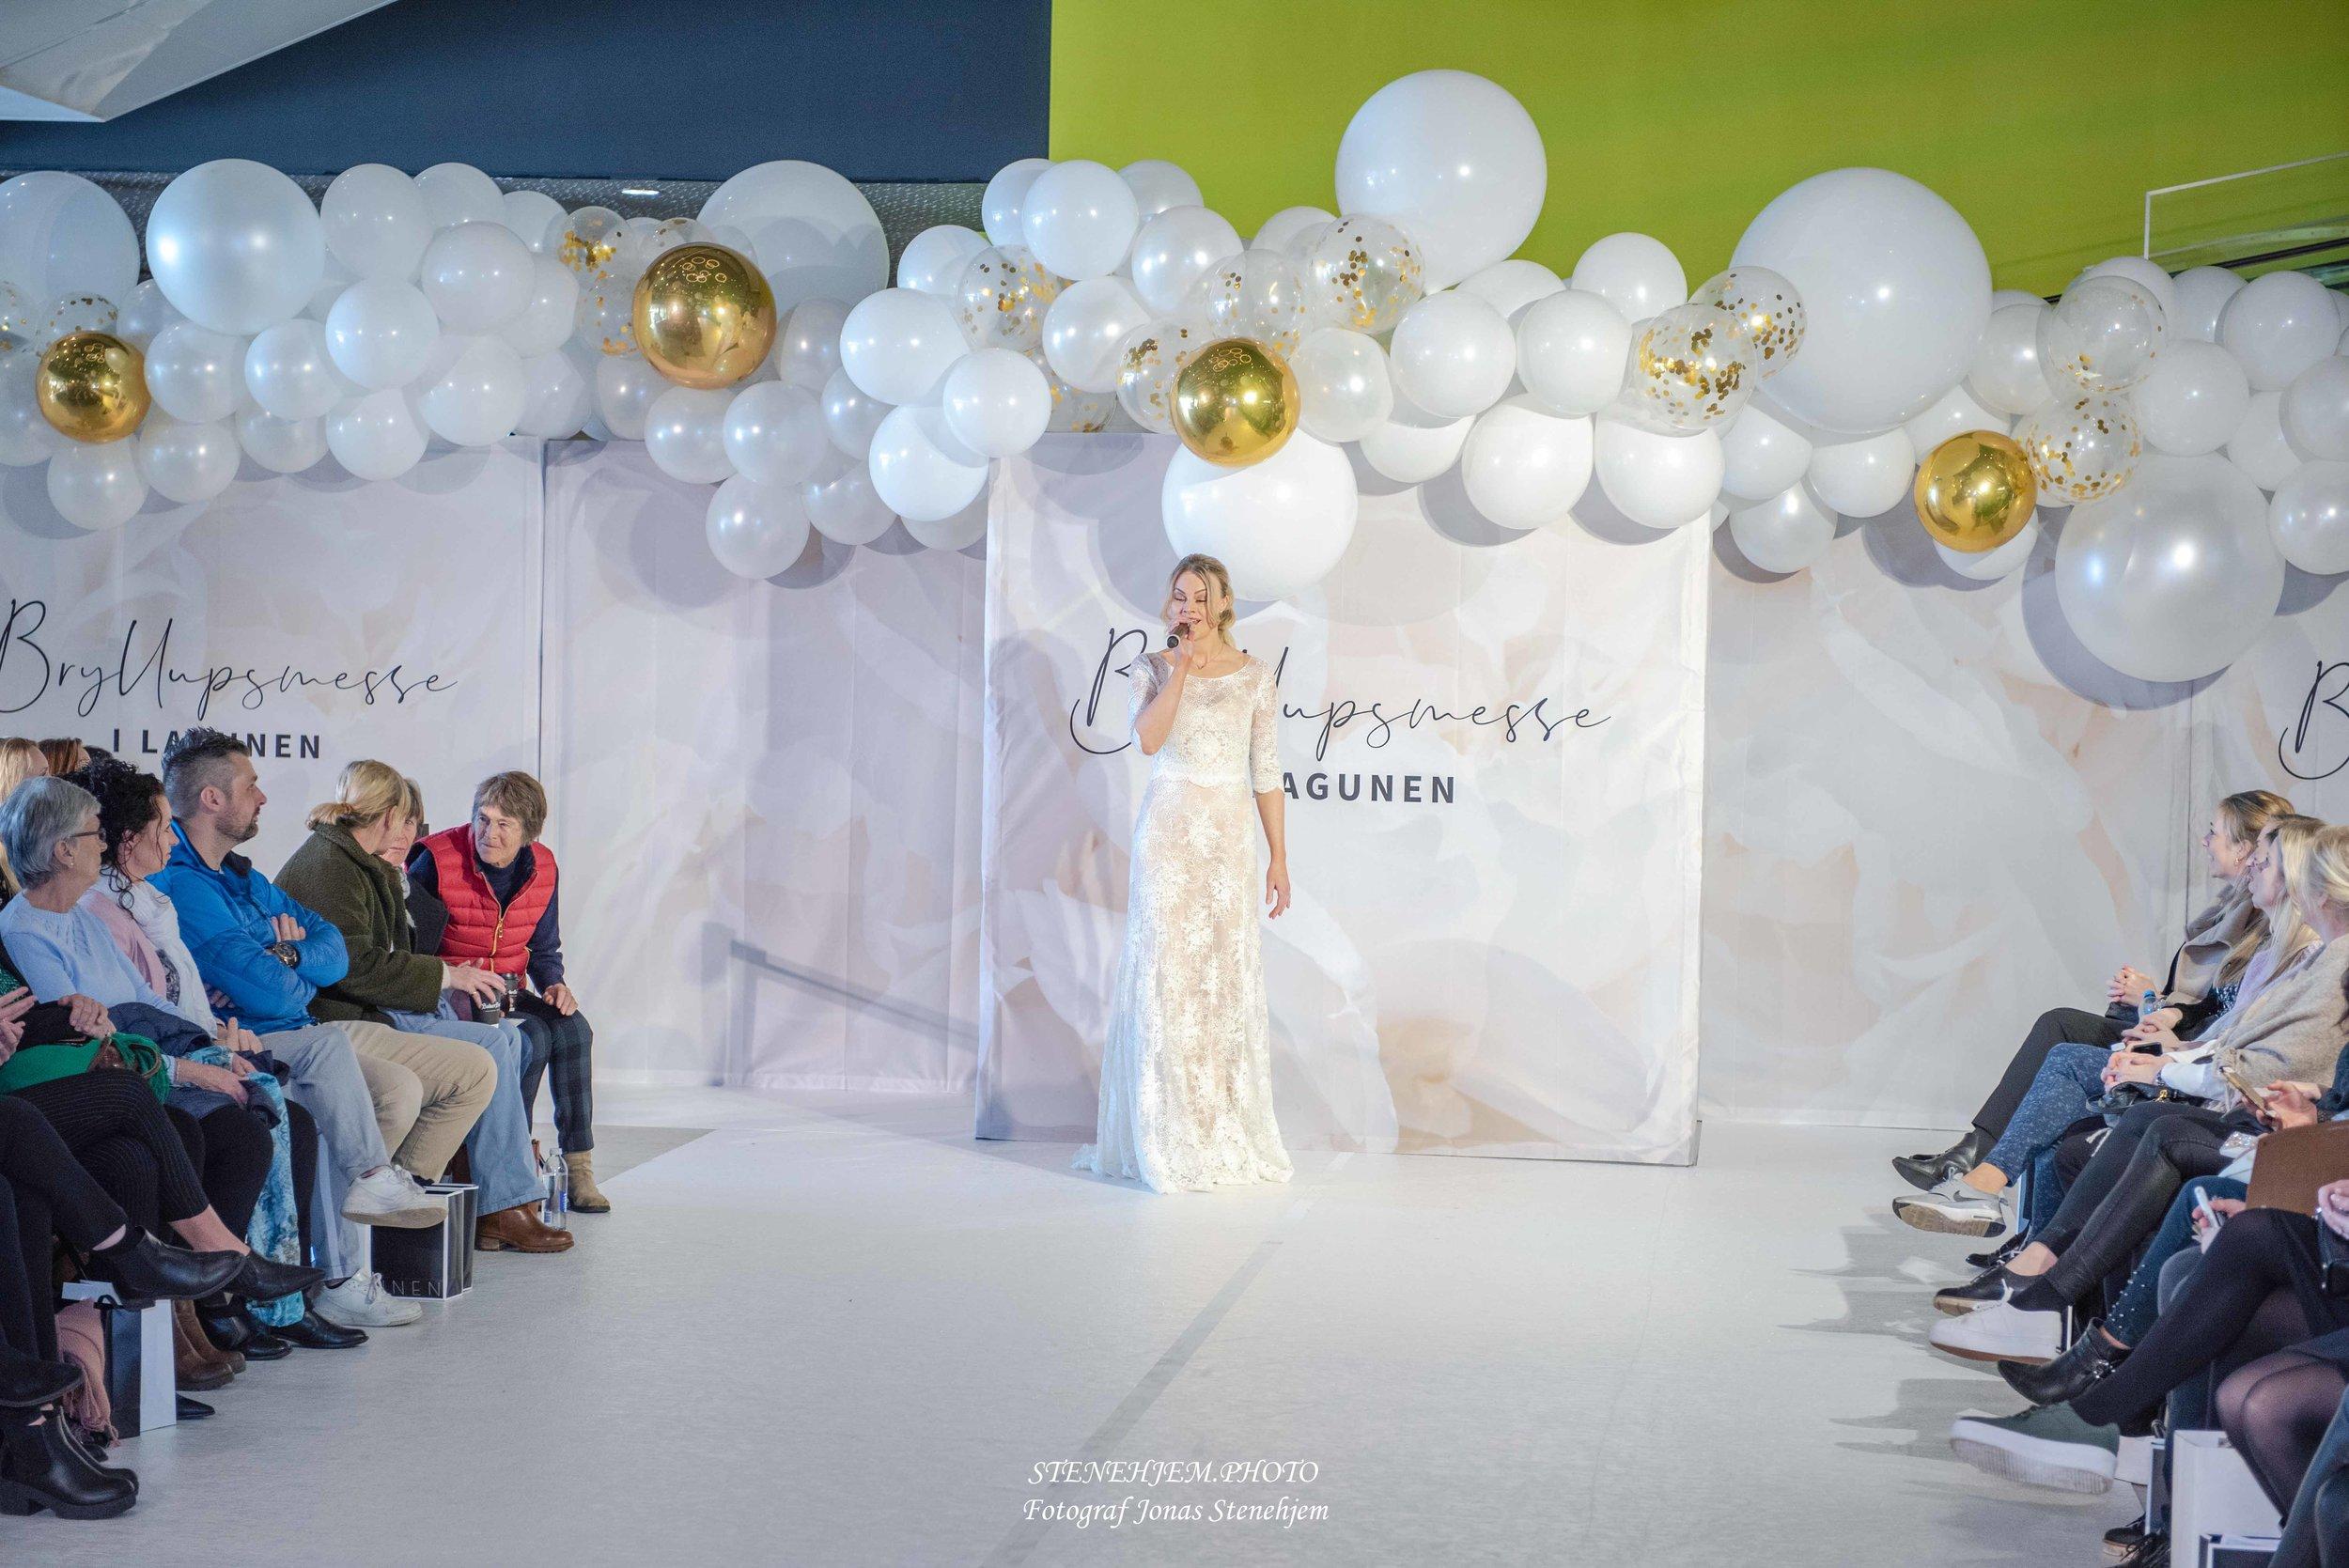 Bryllupsmesse_Lagunen_mittaltweddingfair__018.jpg